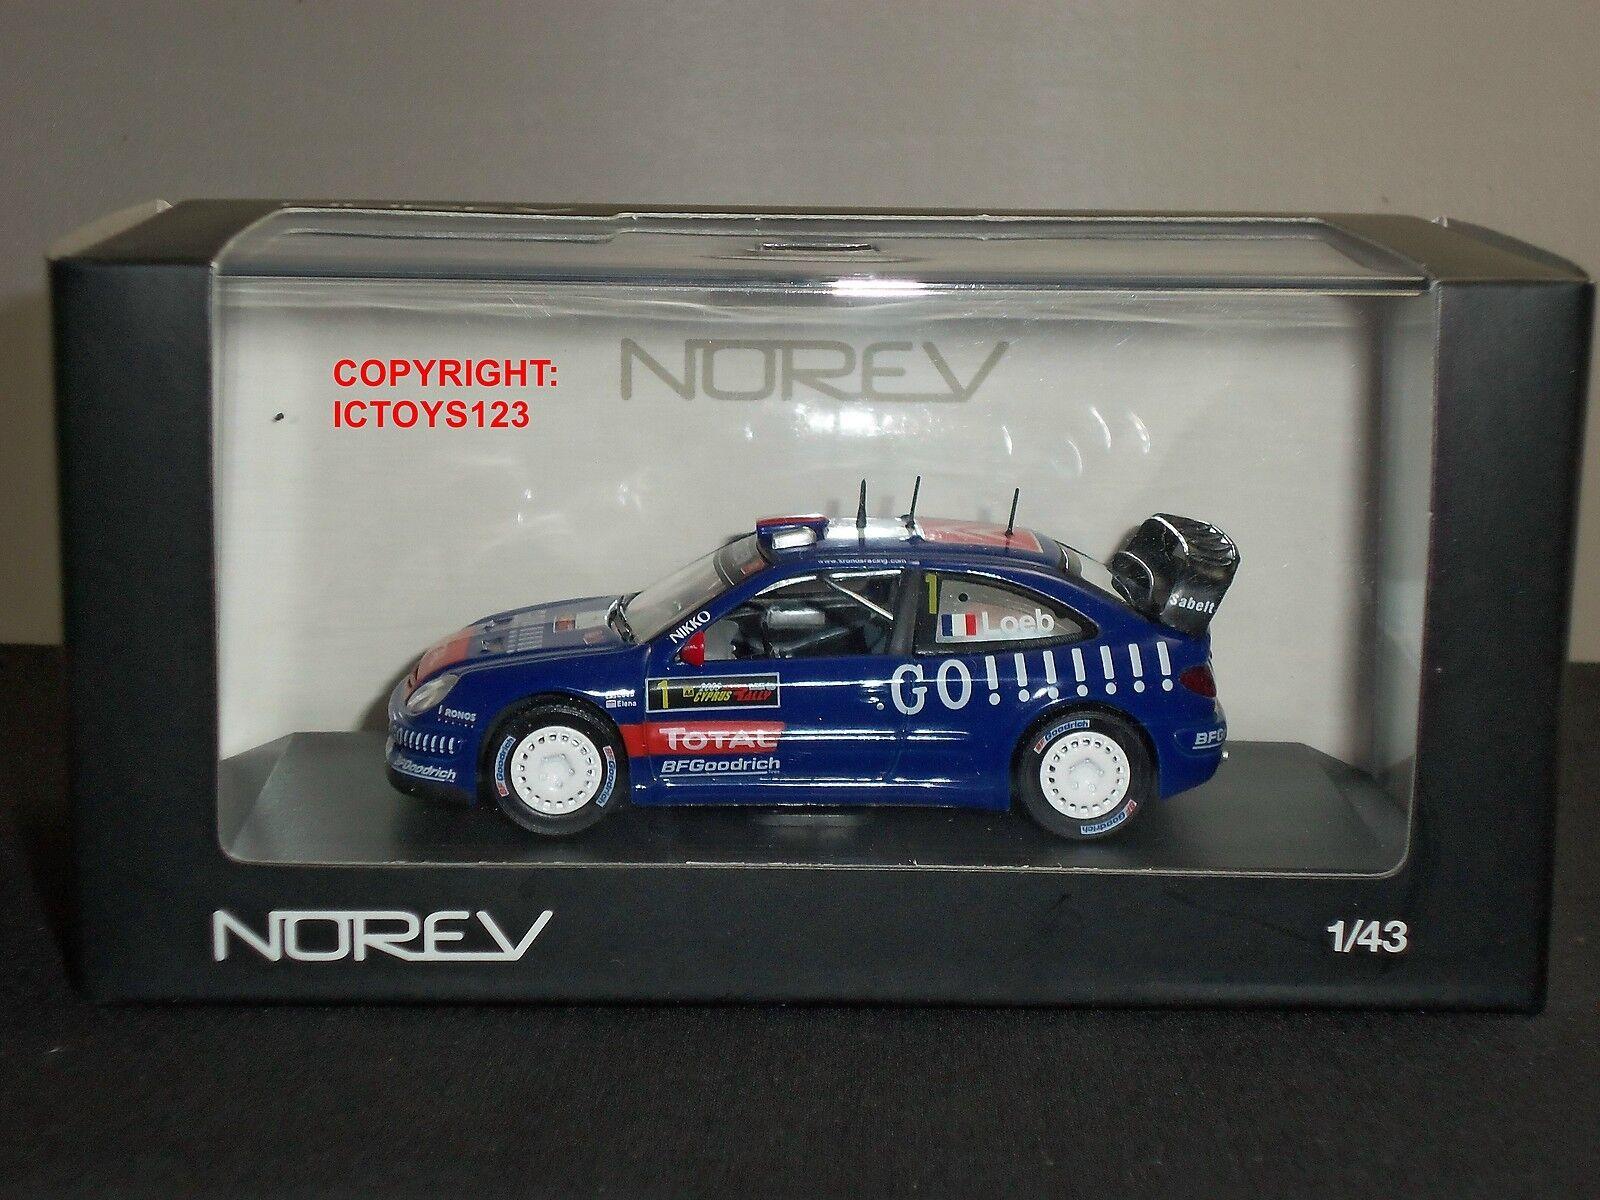 NOREV 159752 CITROEN XSARA WRC KRONUS S LOEB 2006 RALLY DIECAST MODEL CAR